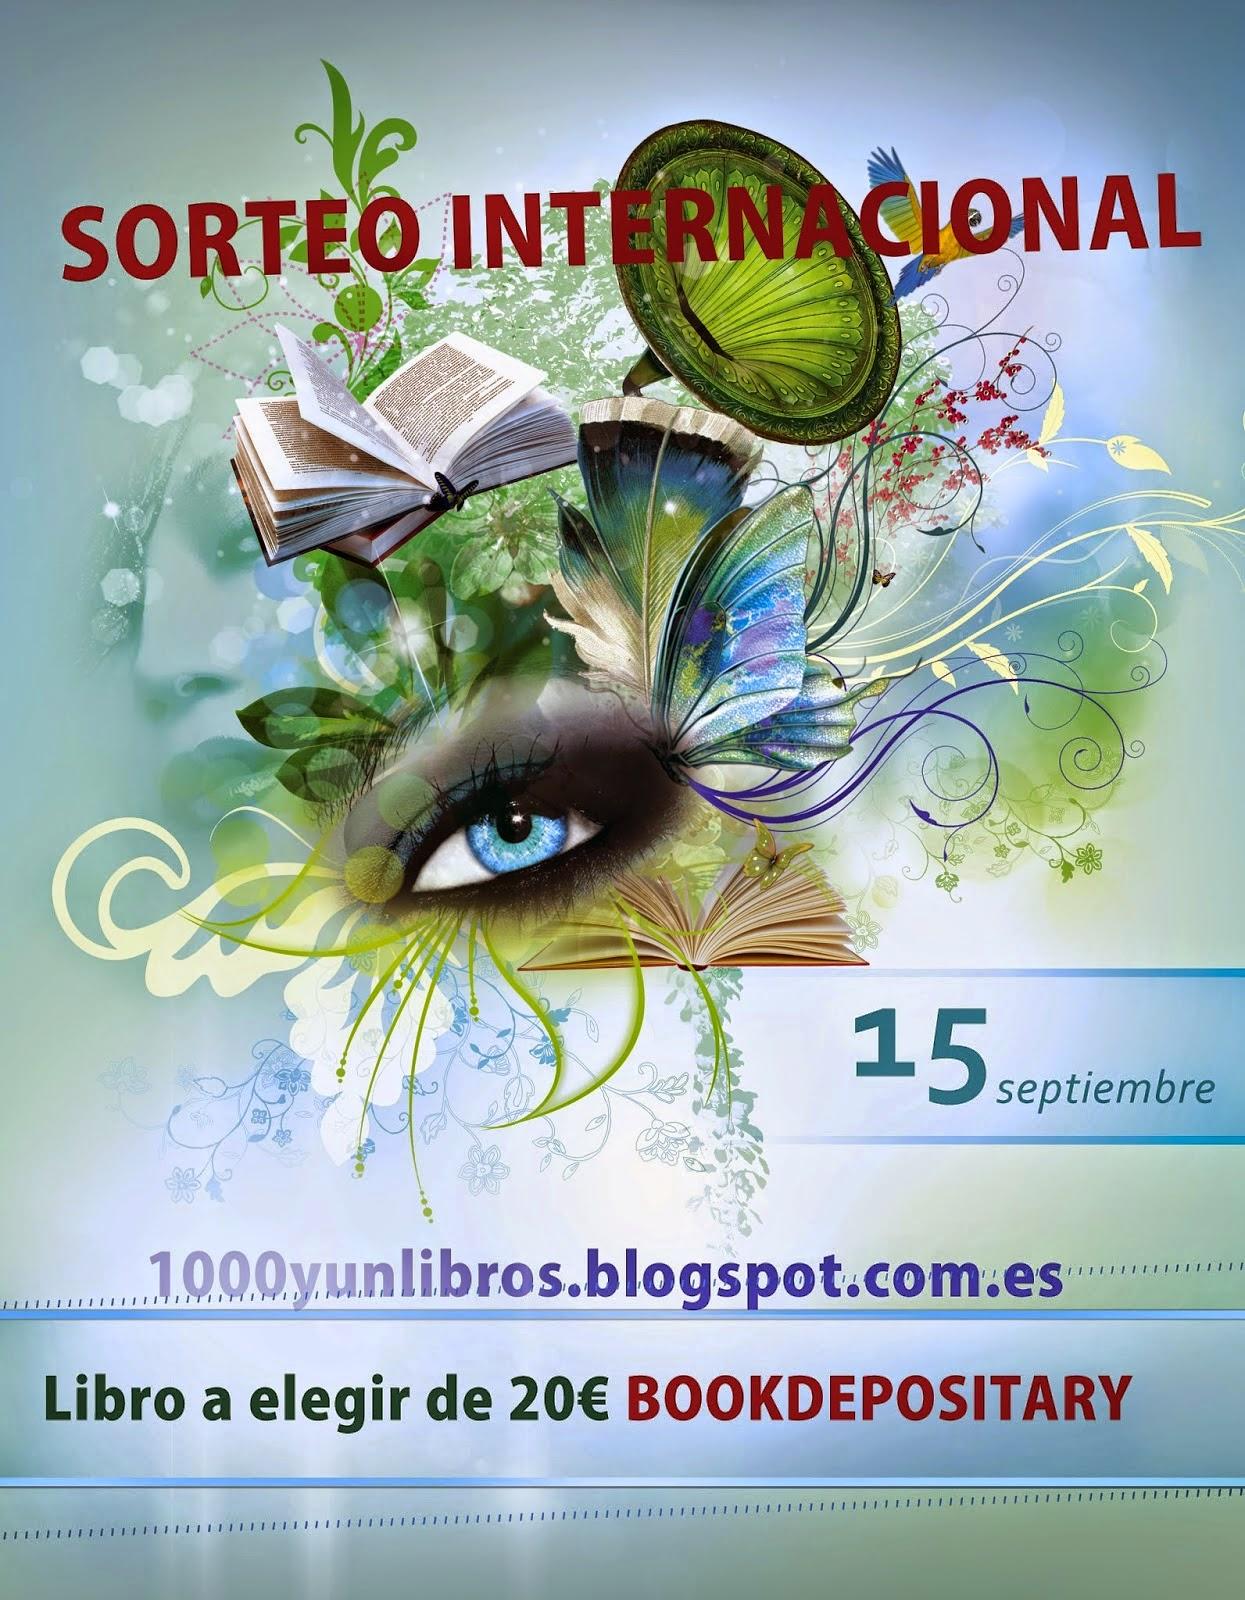 http://1000yunlibros.blogspot.com.es/2014/08/sorteo-50-seguidores.html